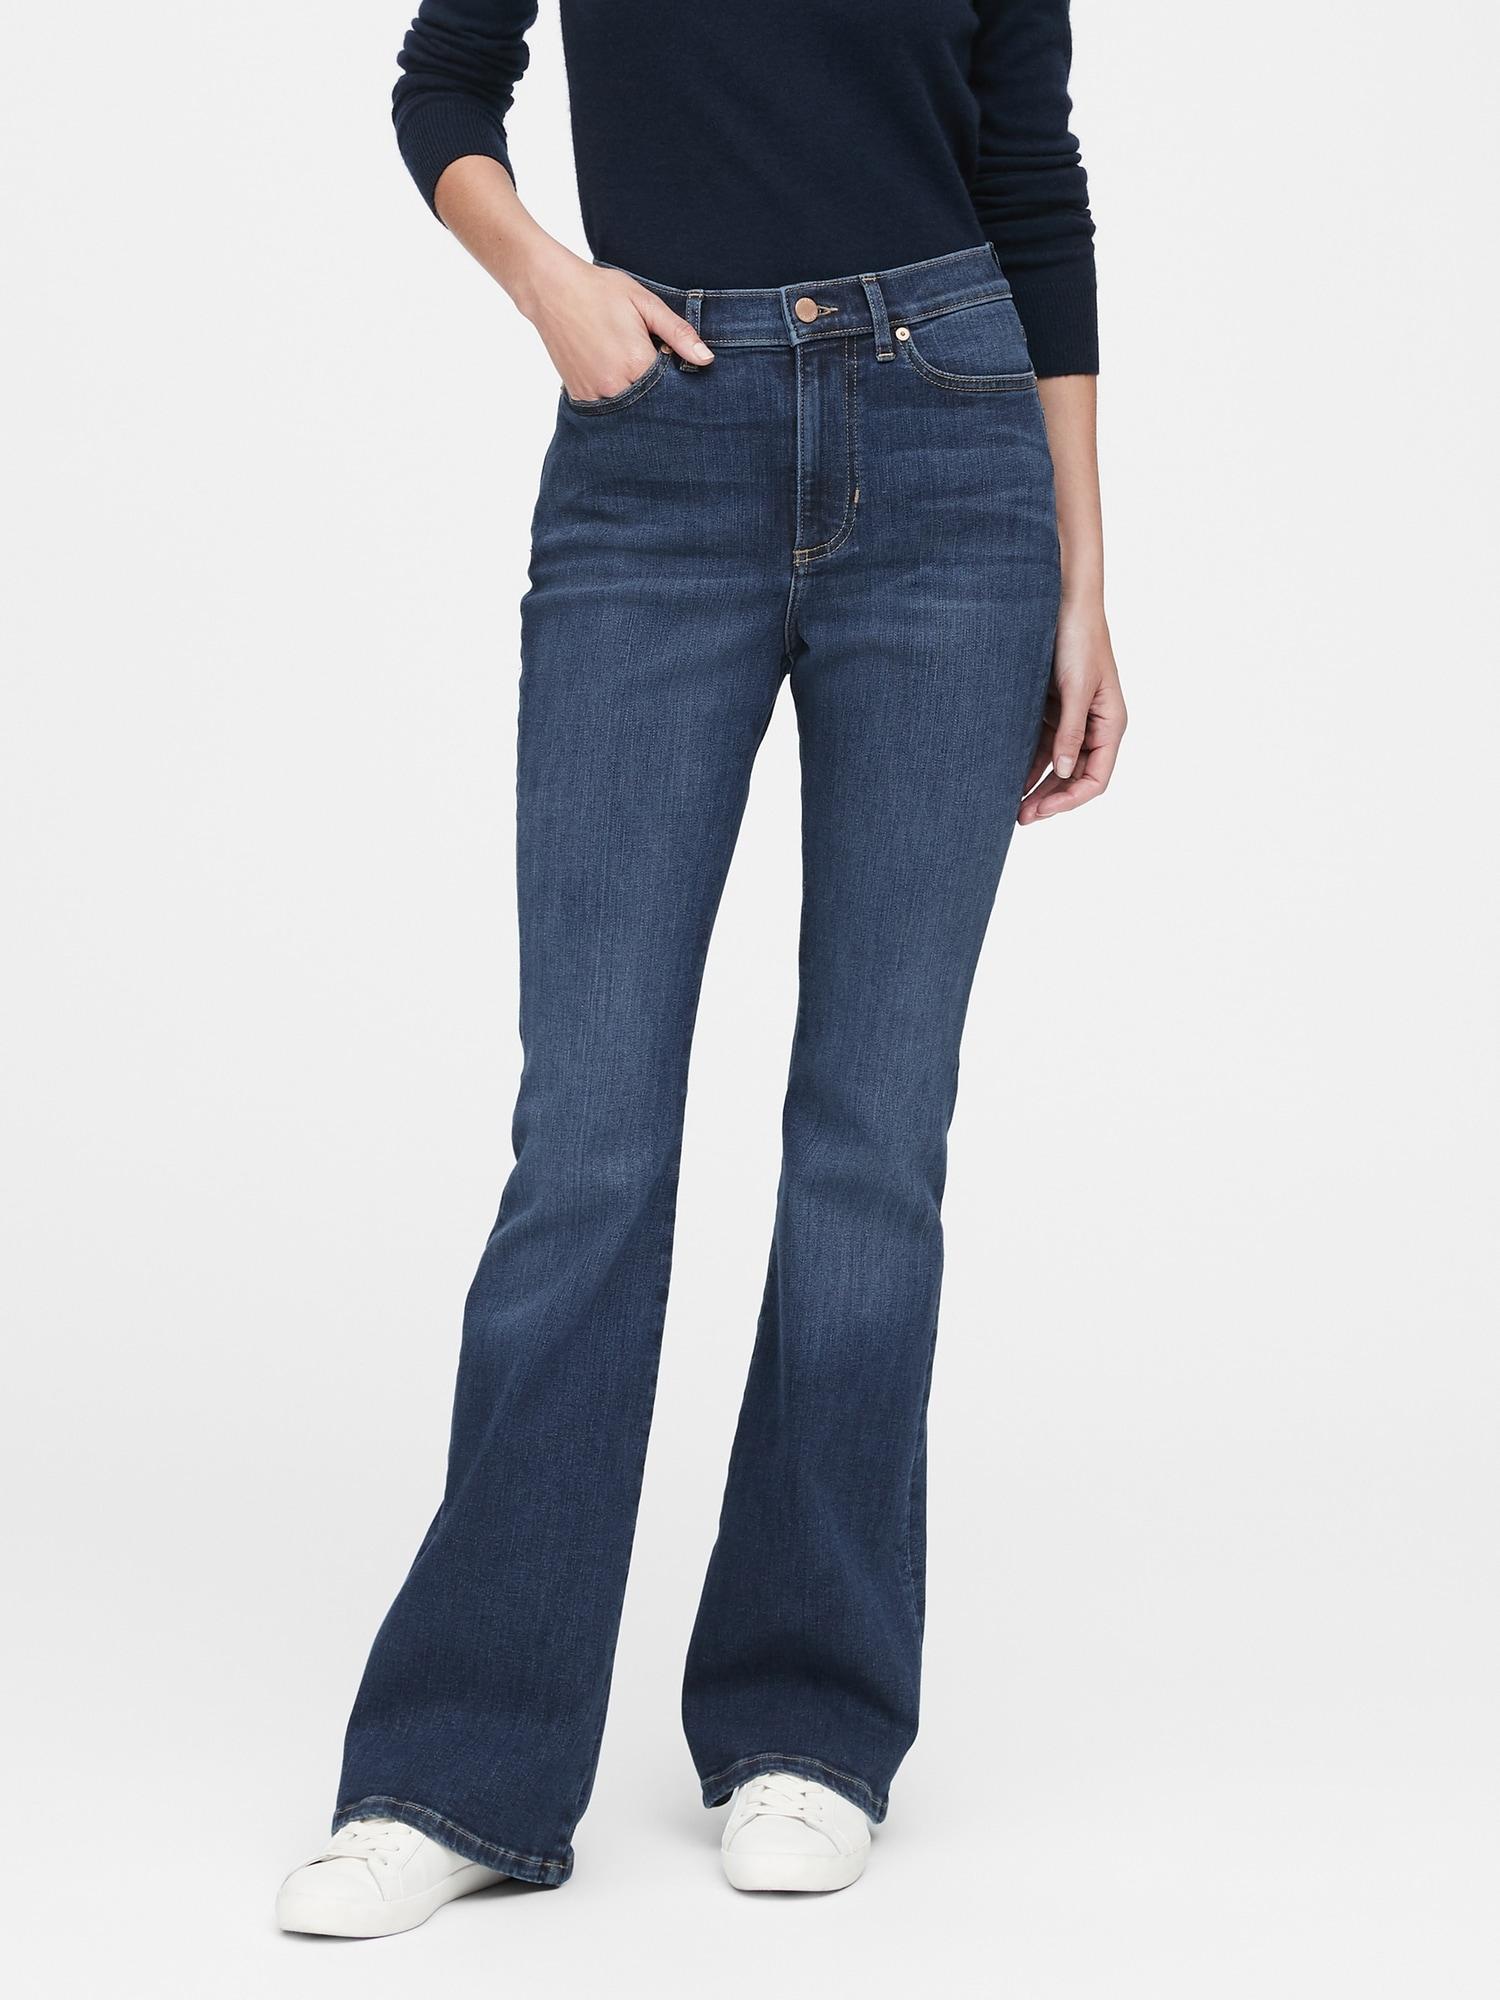 Banana Republic Women/'s Jeans Size 8 Petite Light Wash Stretchy